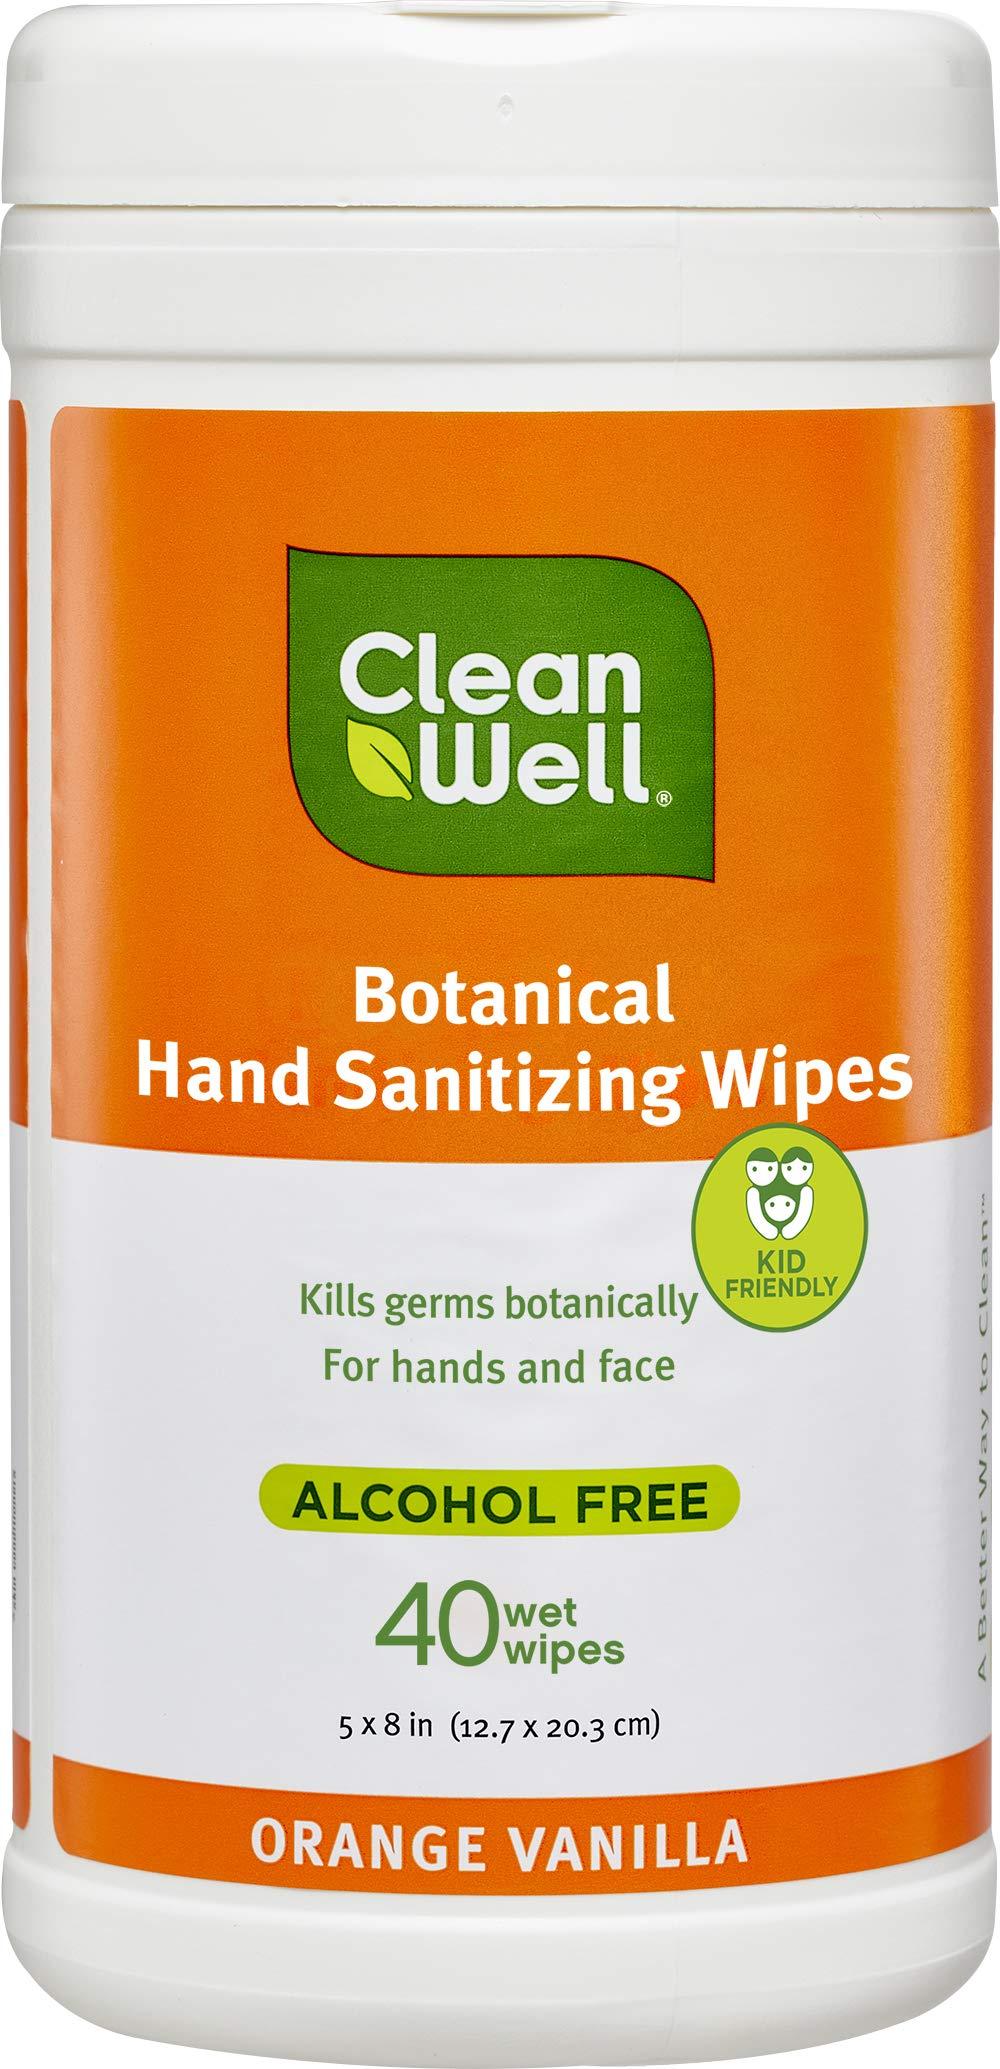 CleanWell Botanical Hand Sanitizer Wipes, Orange Vanilla, 40 count (1 PK) - Alcohol Free, Antibacterial, Kid Friendly, Plant-Based, Nontoxic, Cruelty Free, Moisturizing Formula